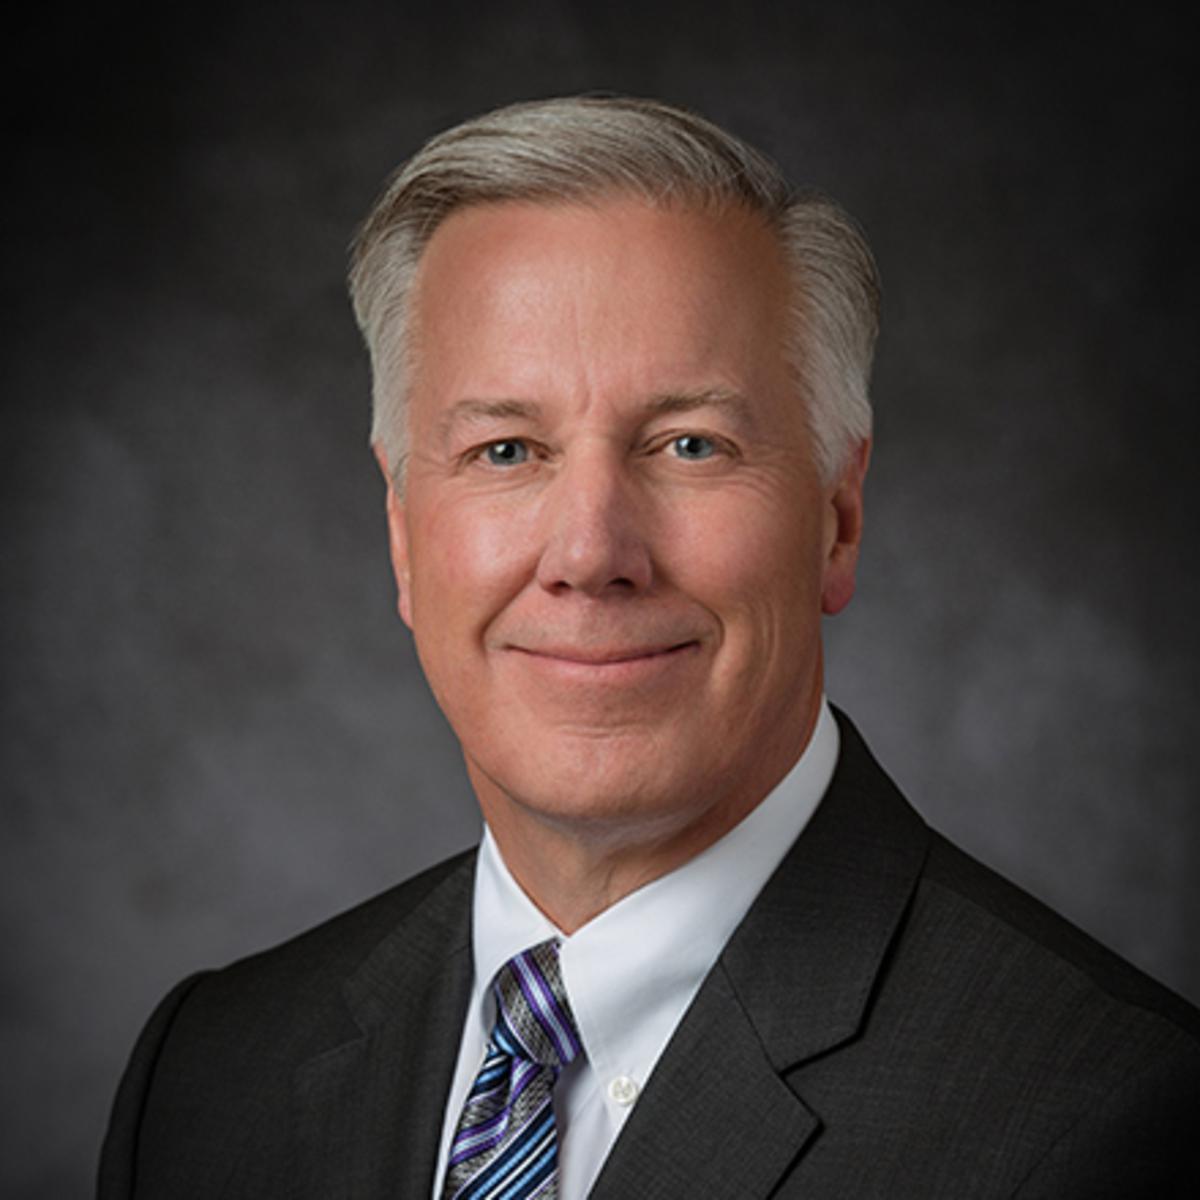 Elder Kevin S. Hamilton